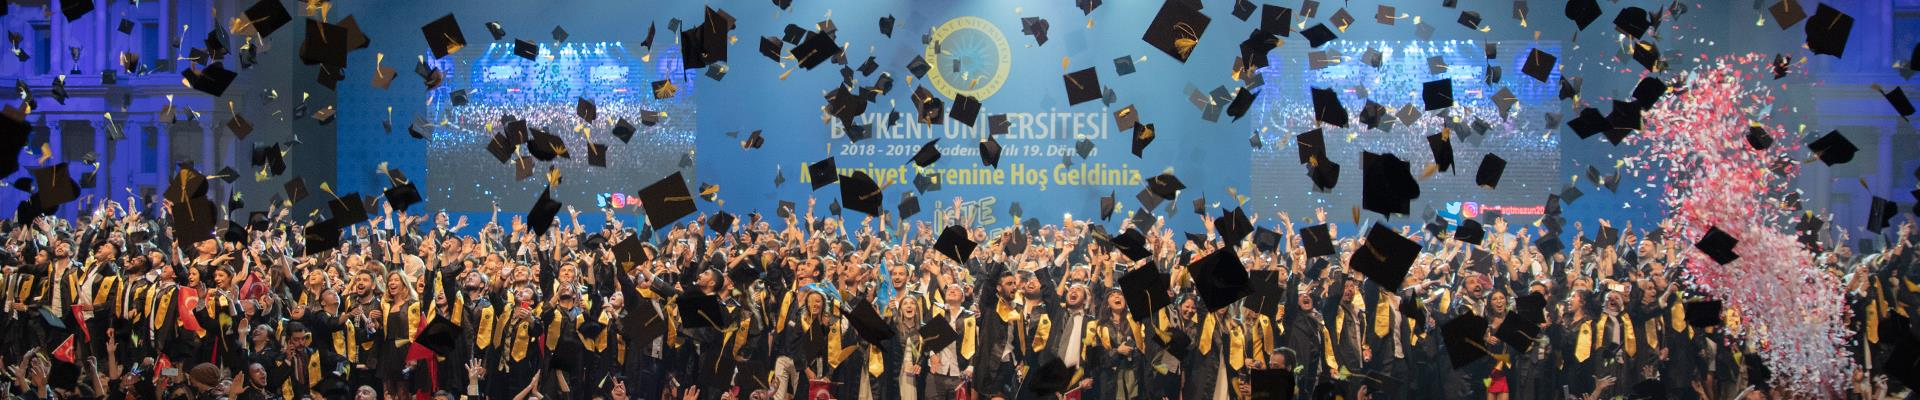 mezuniyet-2018-2019